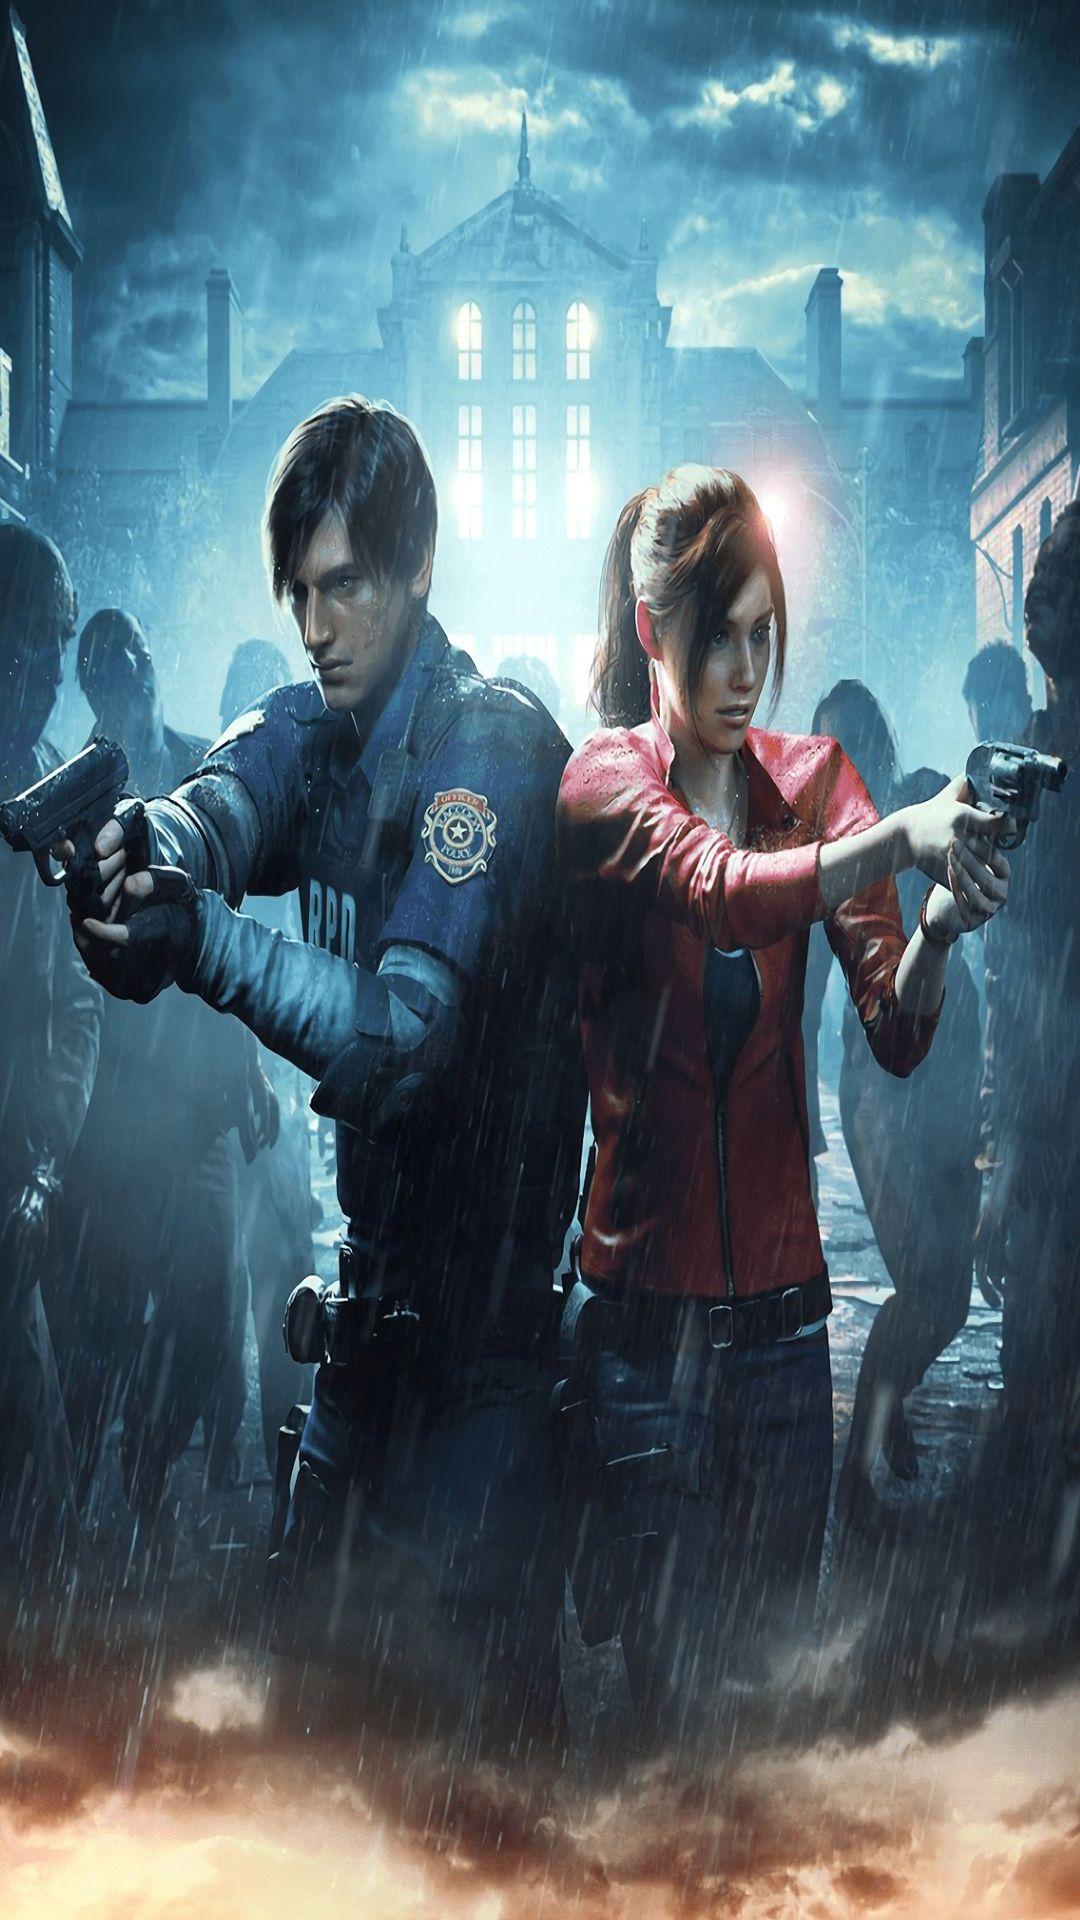 Fondos De Pantallas Resident Evil Para Android Ios Gratis Link